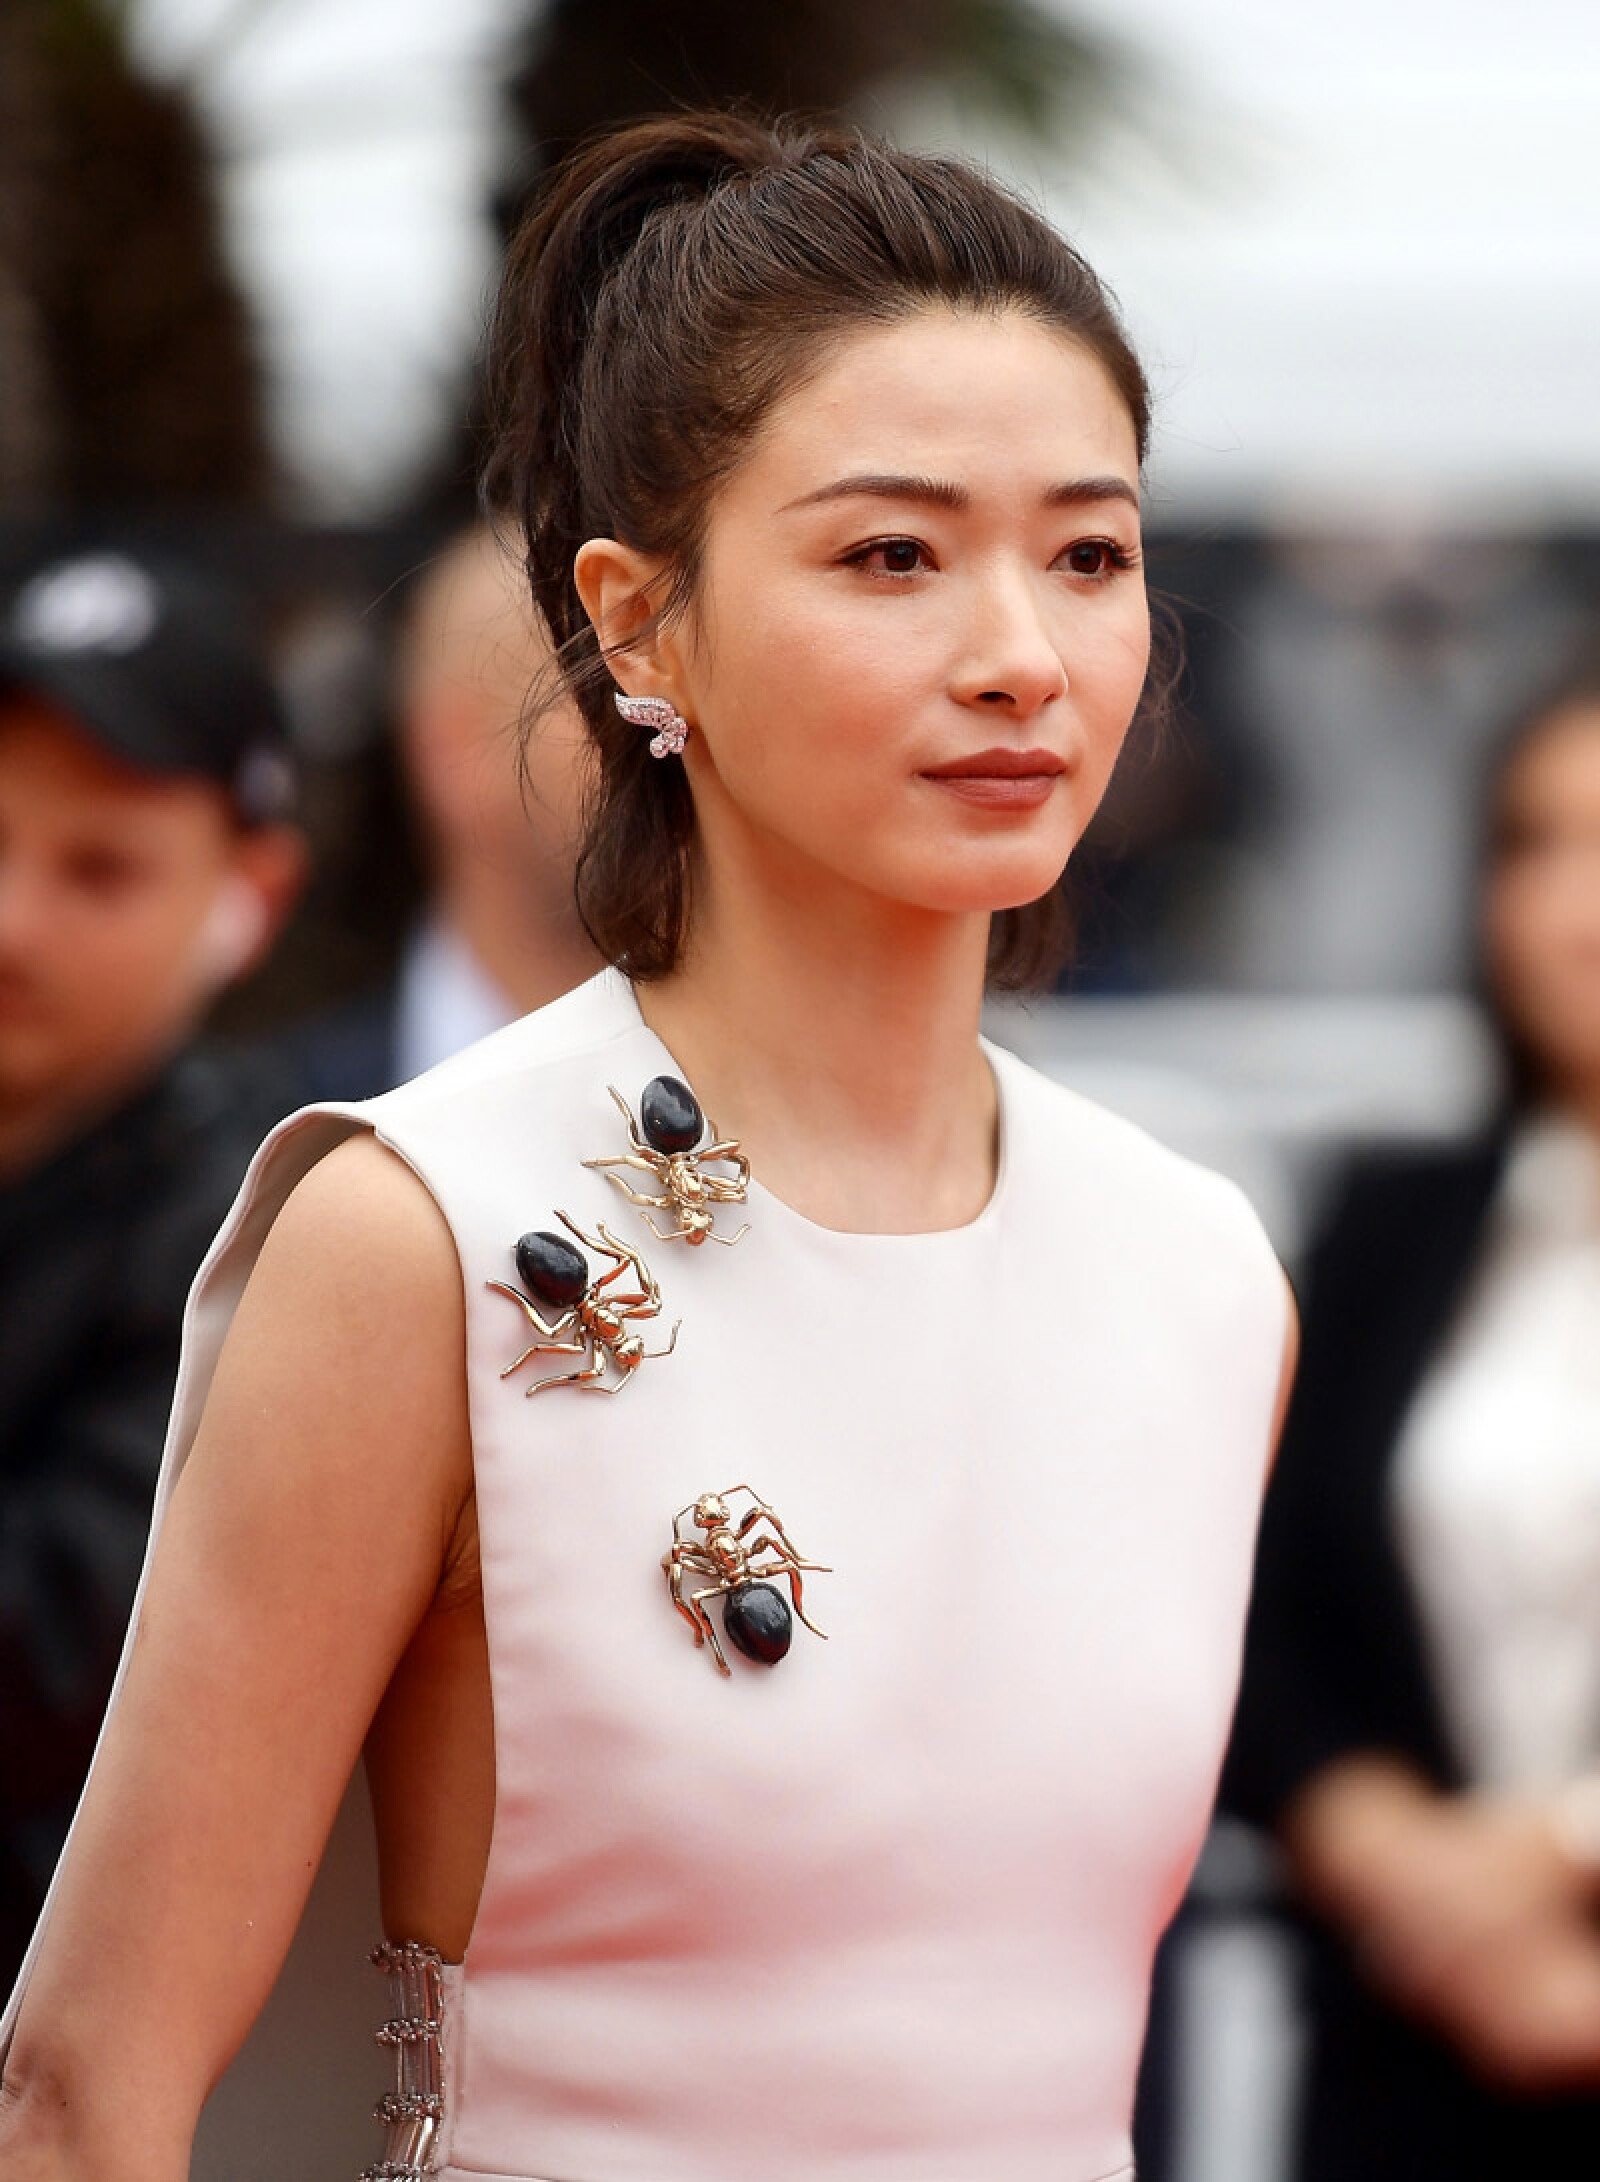 """The Wild Goose Lake (Nan Fang Che Zhan De Ju Hui/ Le Lac Aux Oies Sauvages)"" Red Carpet - The 72nd Annual Cannes Film Festival"